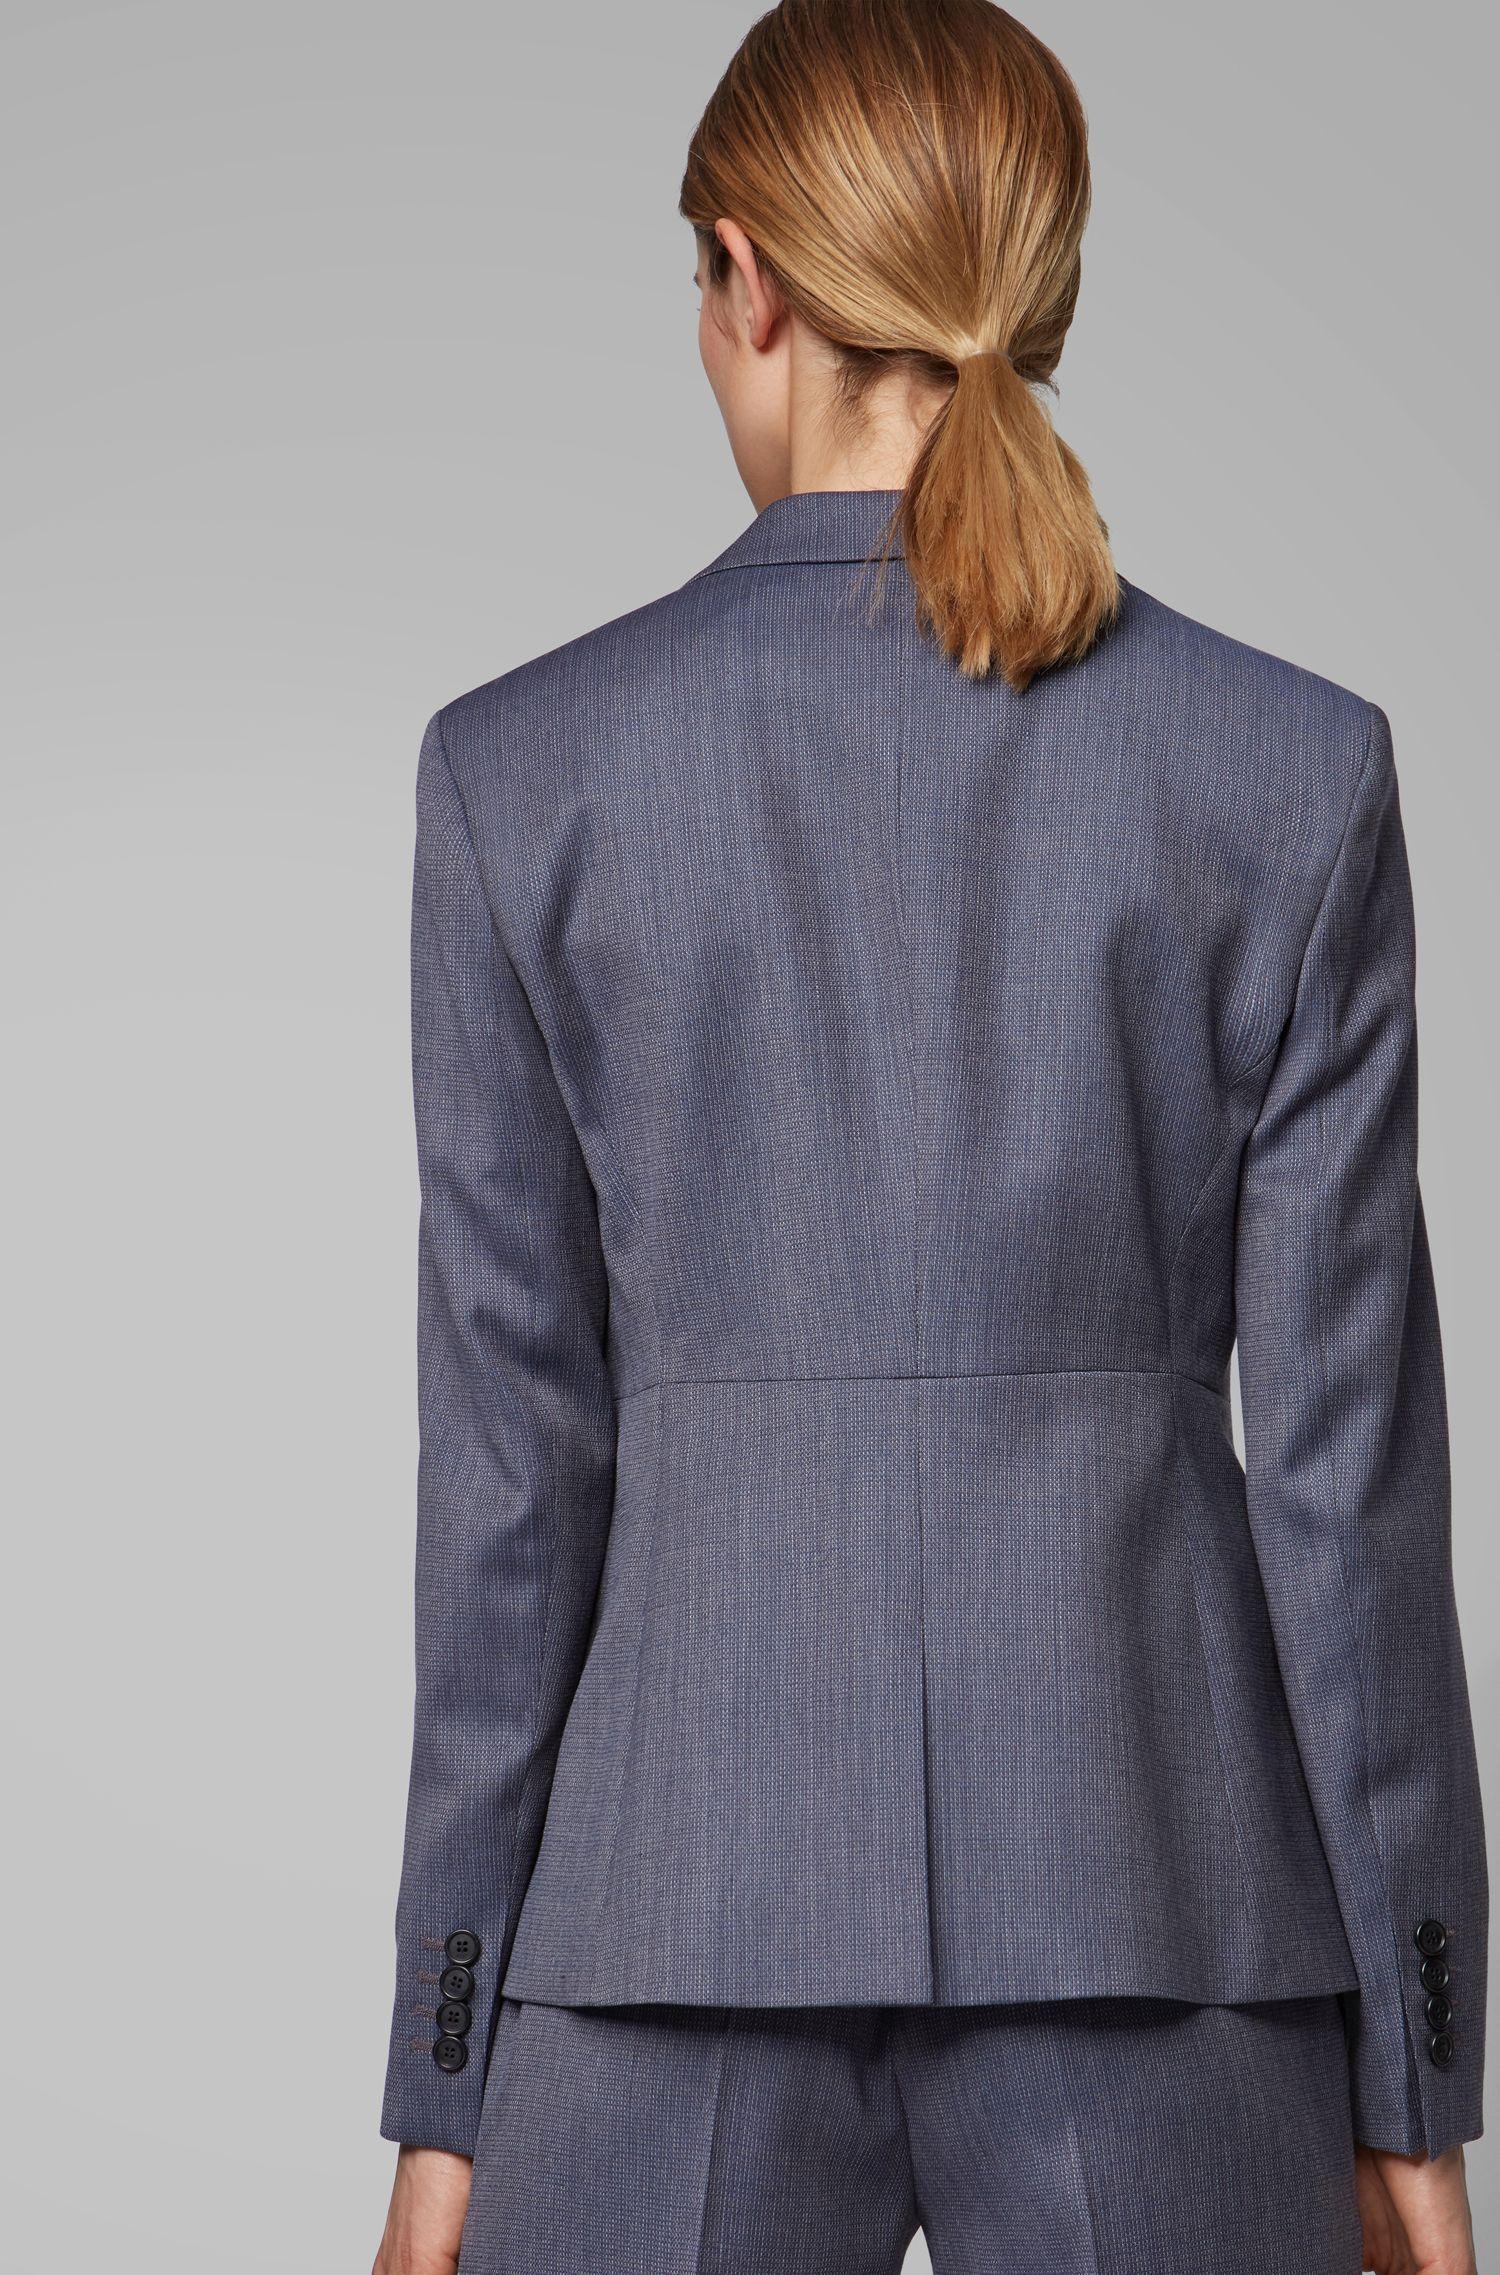 Regular-fit jacket in micro-patterned Italian virgin wool, Patterned